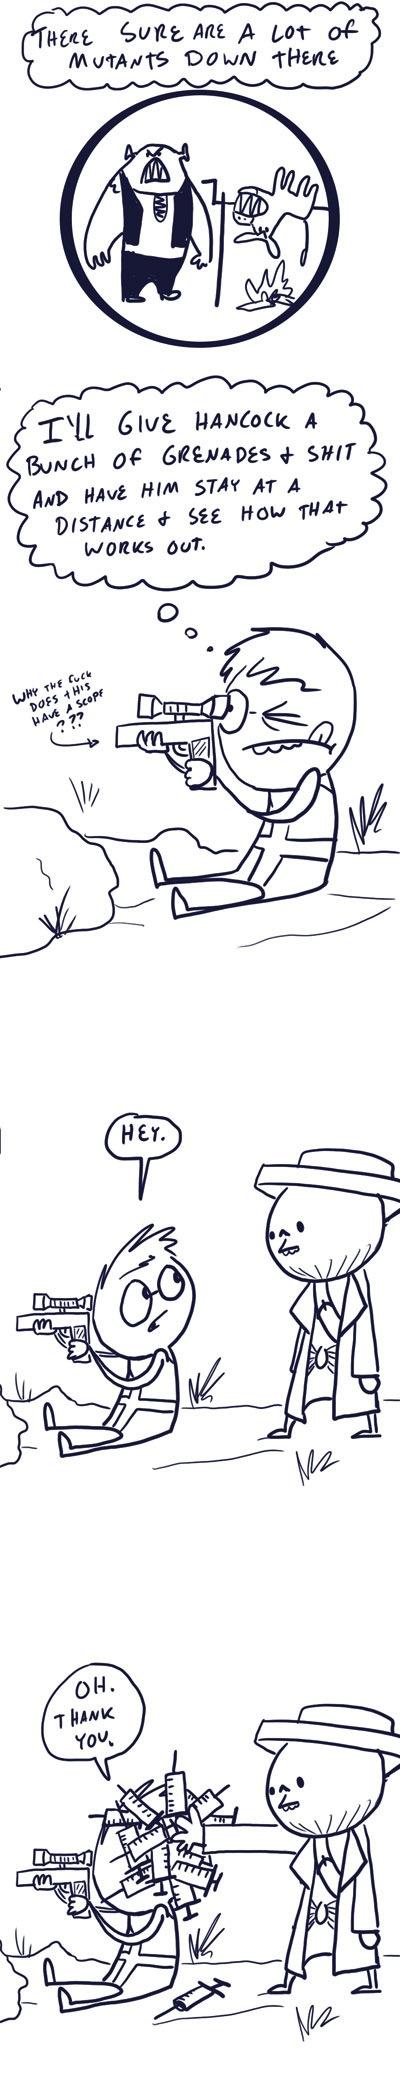 Fallout Comics - Strategy